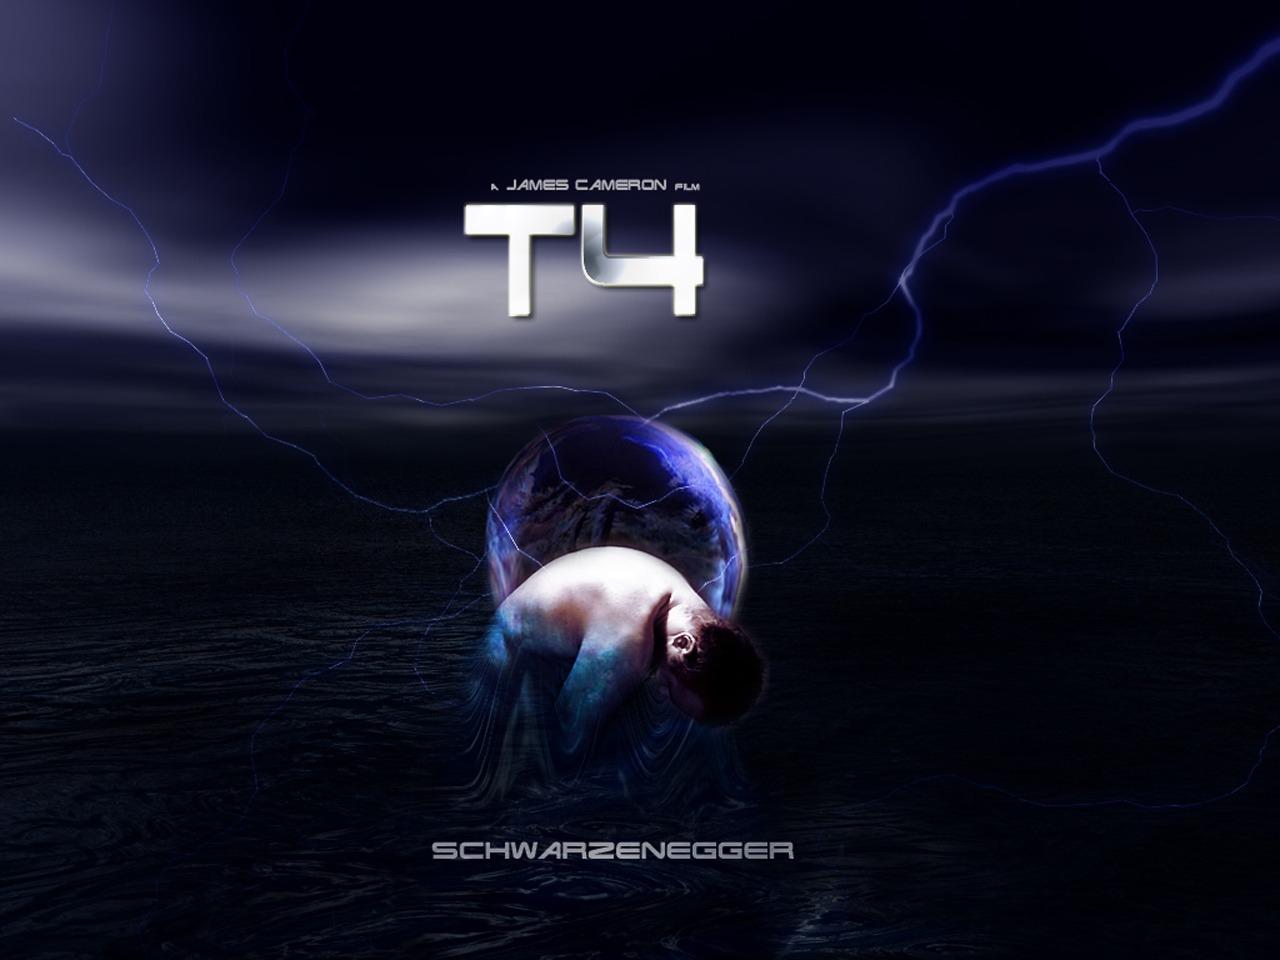 Terminator salvation™ – raw thrills, inc.